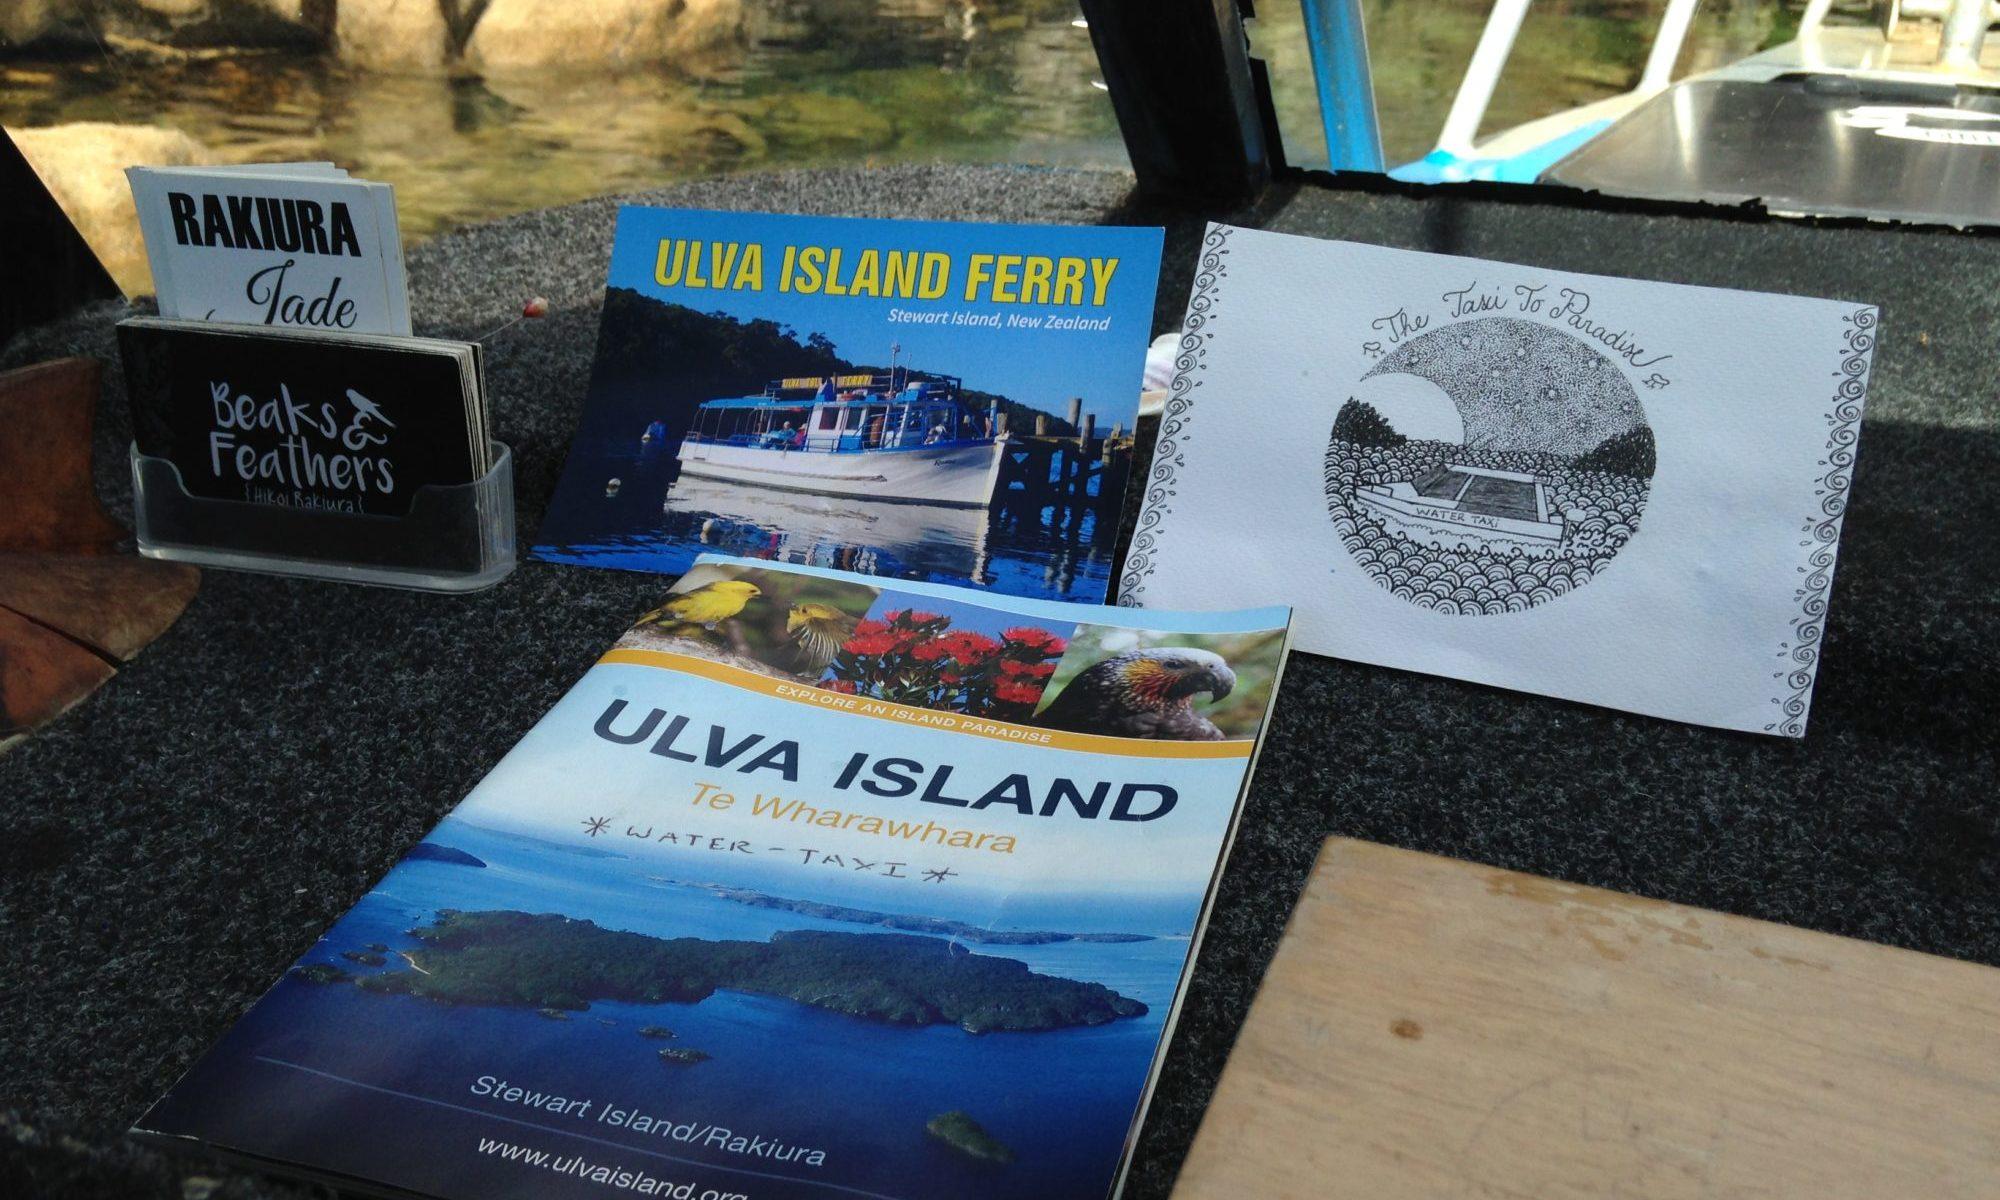 Visit Ulva Island - Self guiding bookelt aboard Kaian